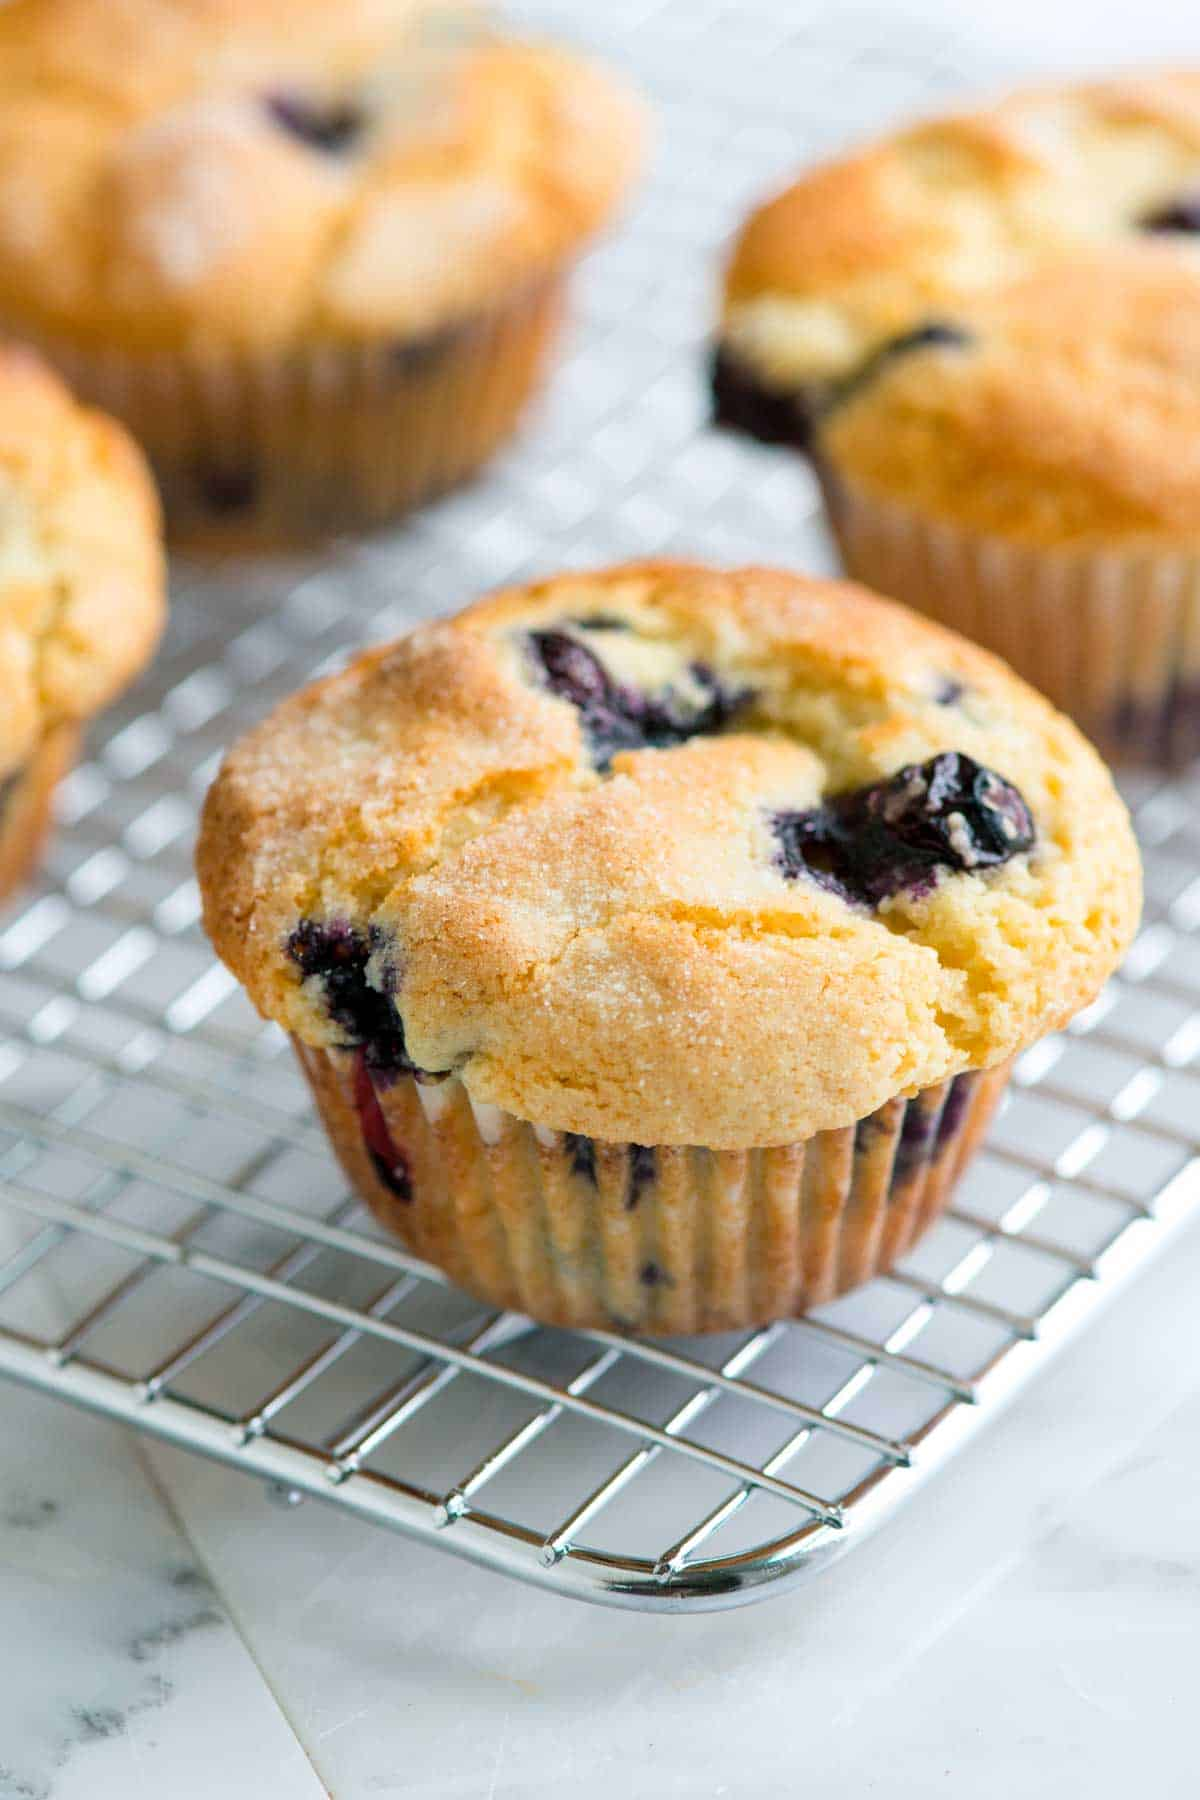 Easy-Blueberry-Muffin-Recipe-1-1200.jpg